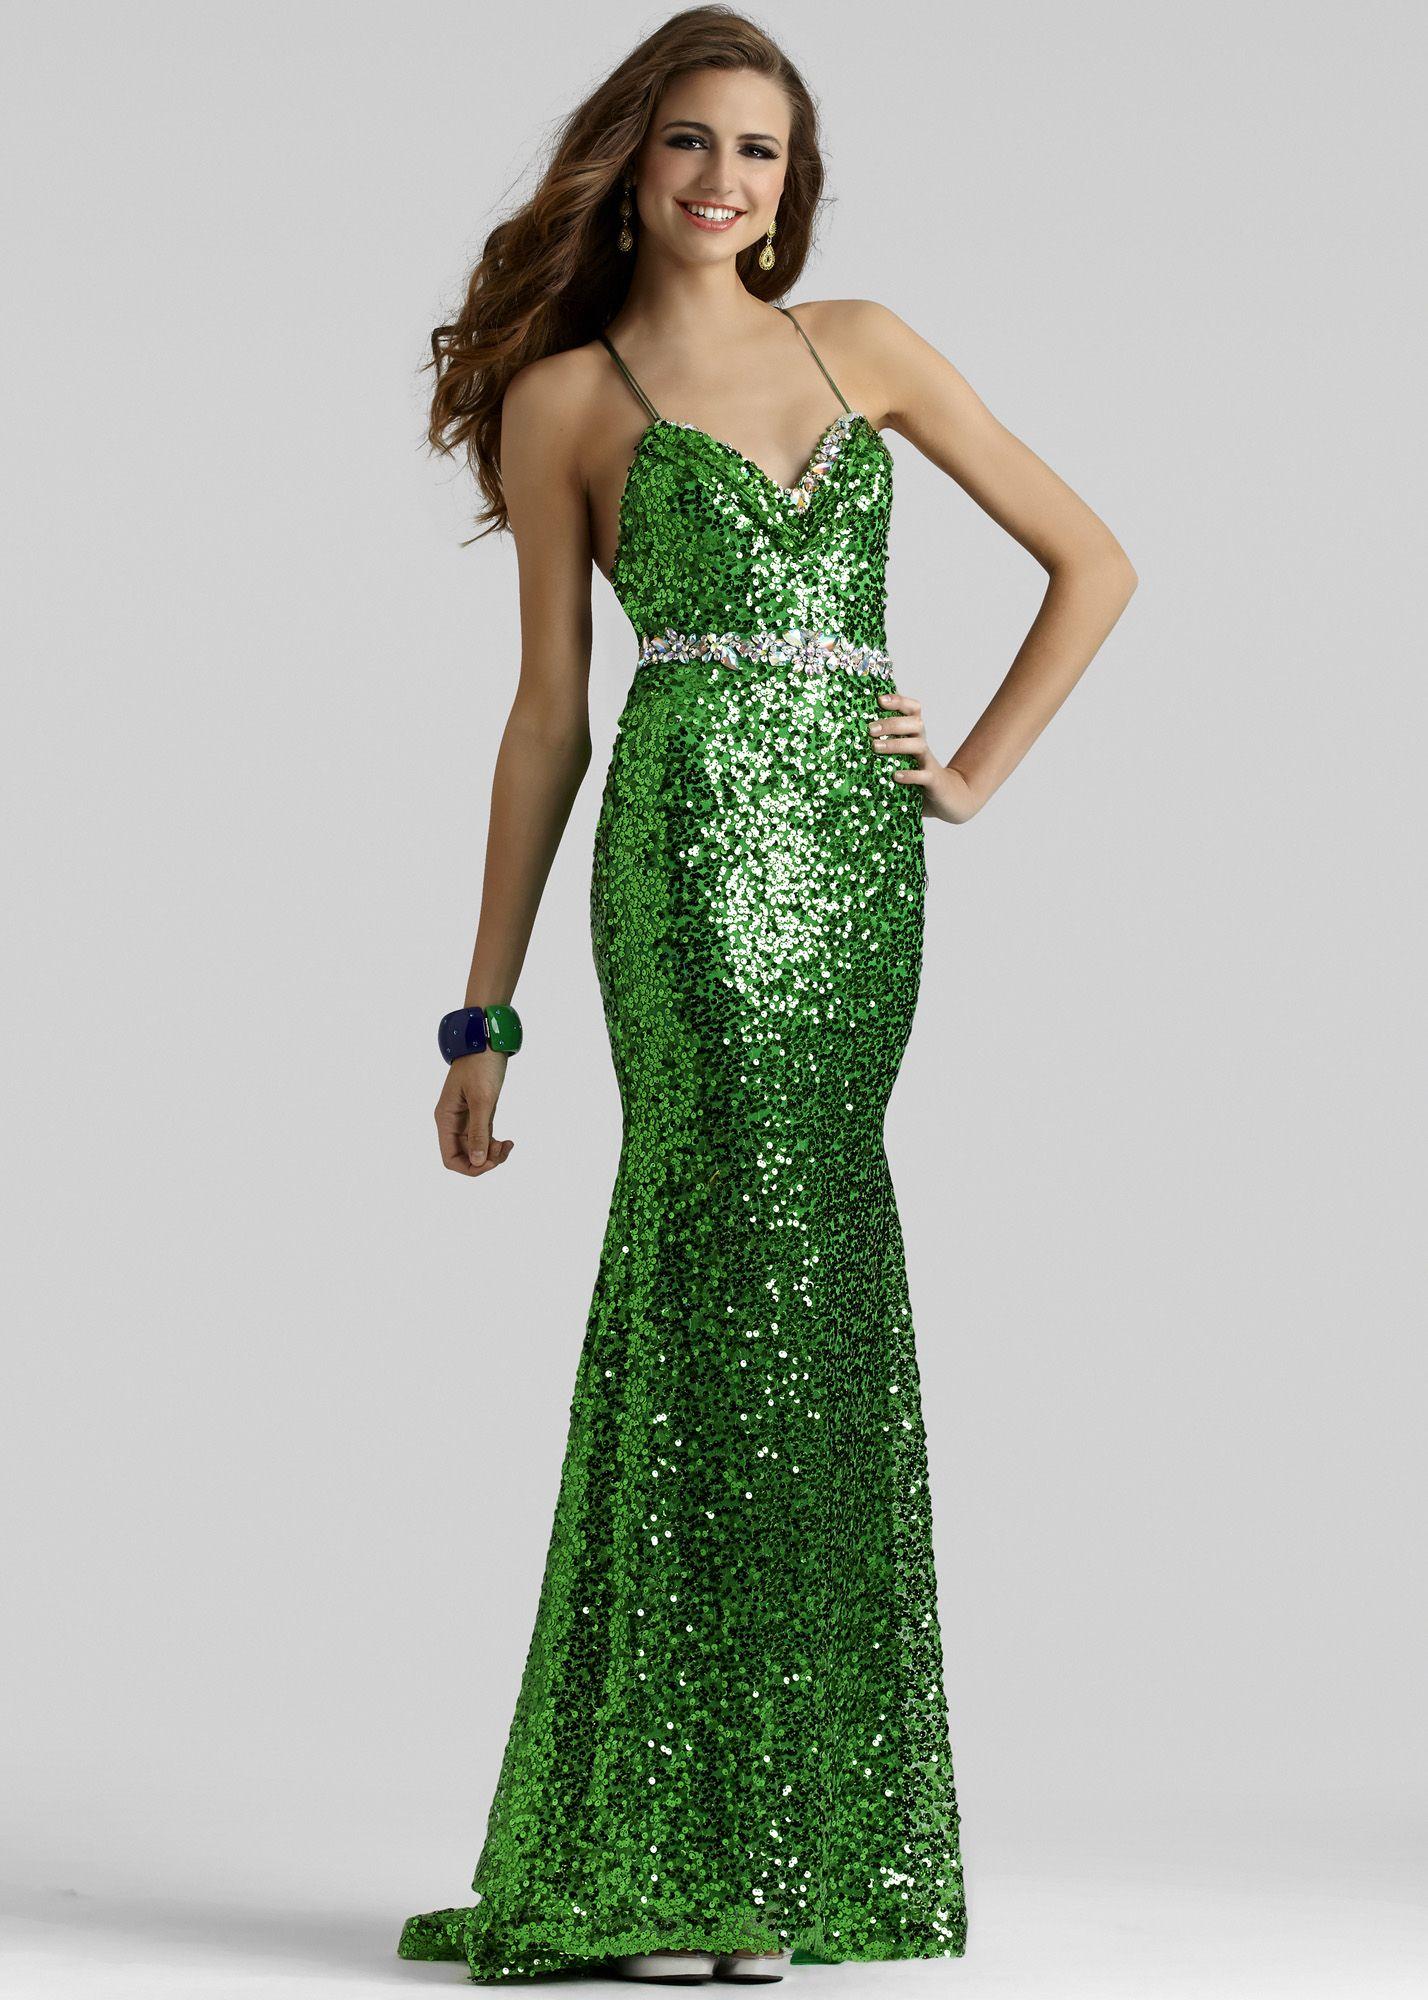 Clarisse emerald one shoulder prom dress thanks